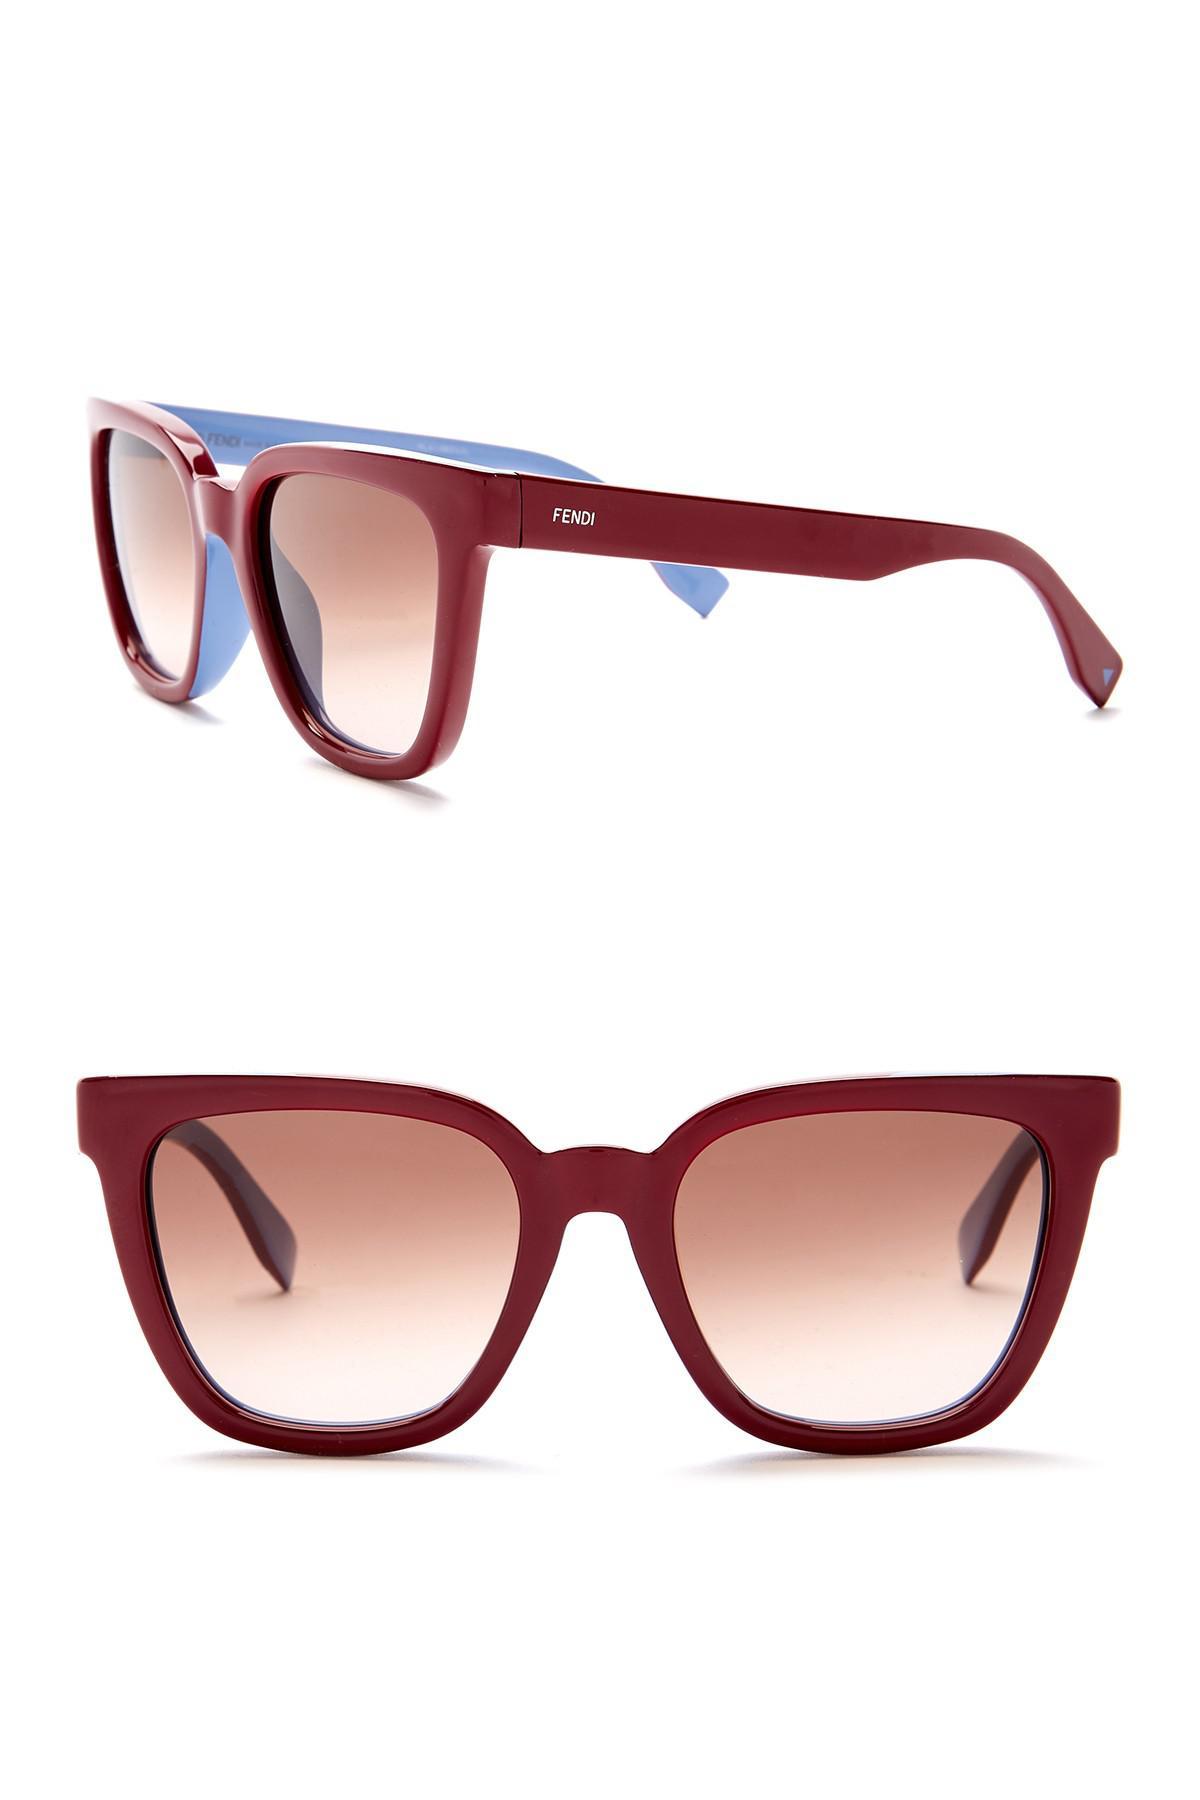 56e7270bce39 Lyst - Fendi 53mm Oversized Sunglasses